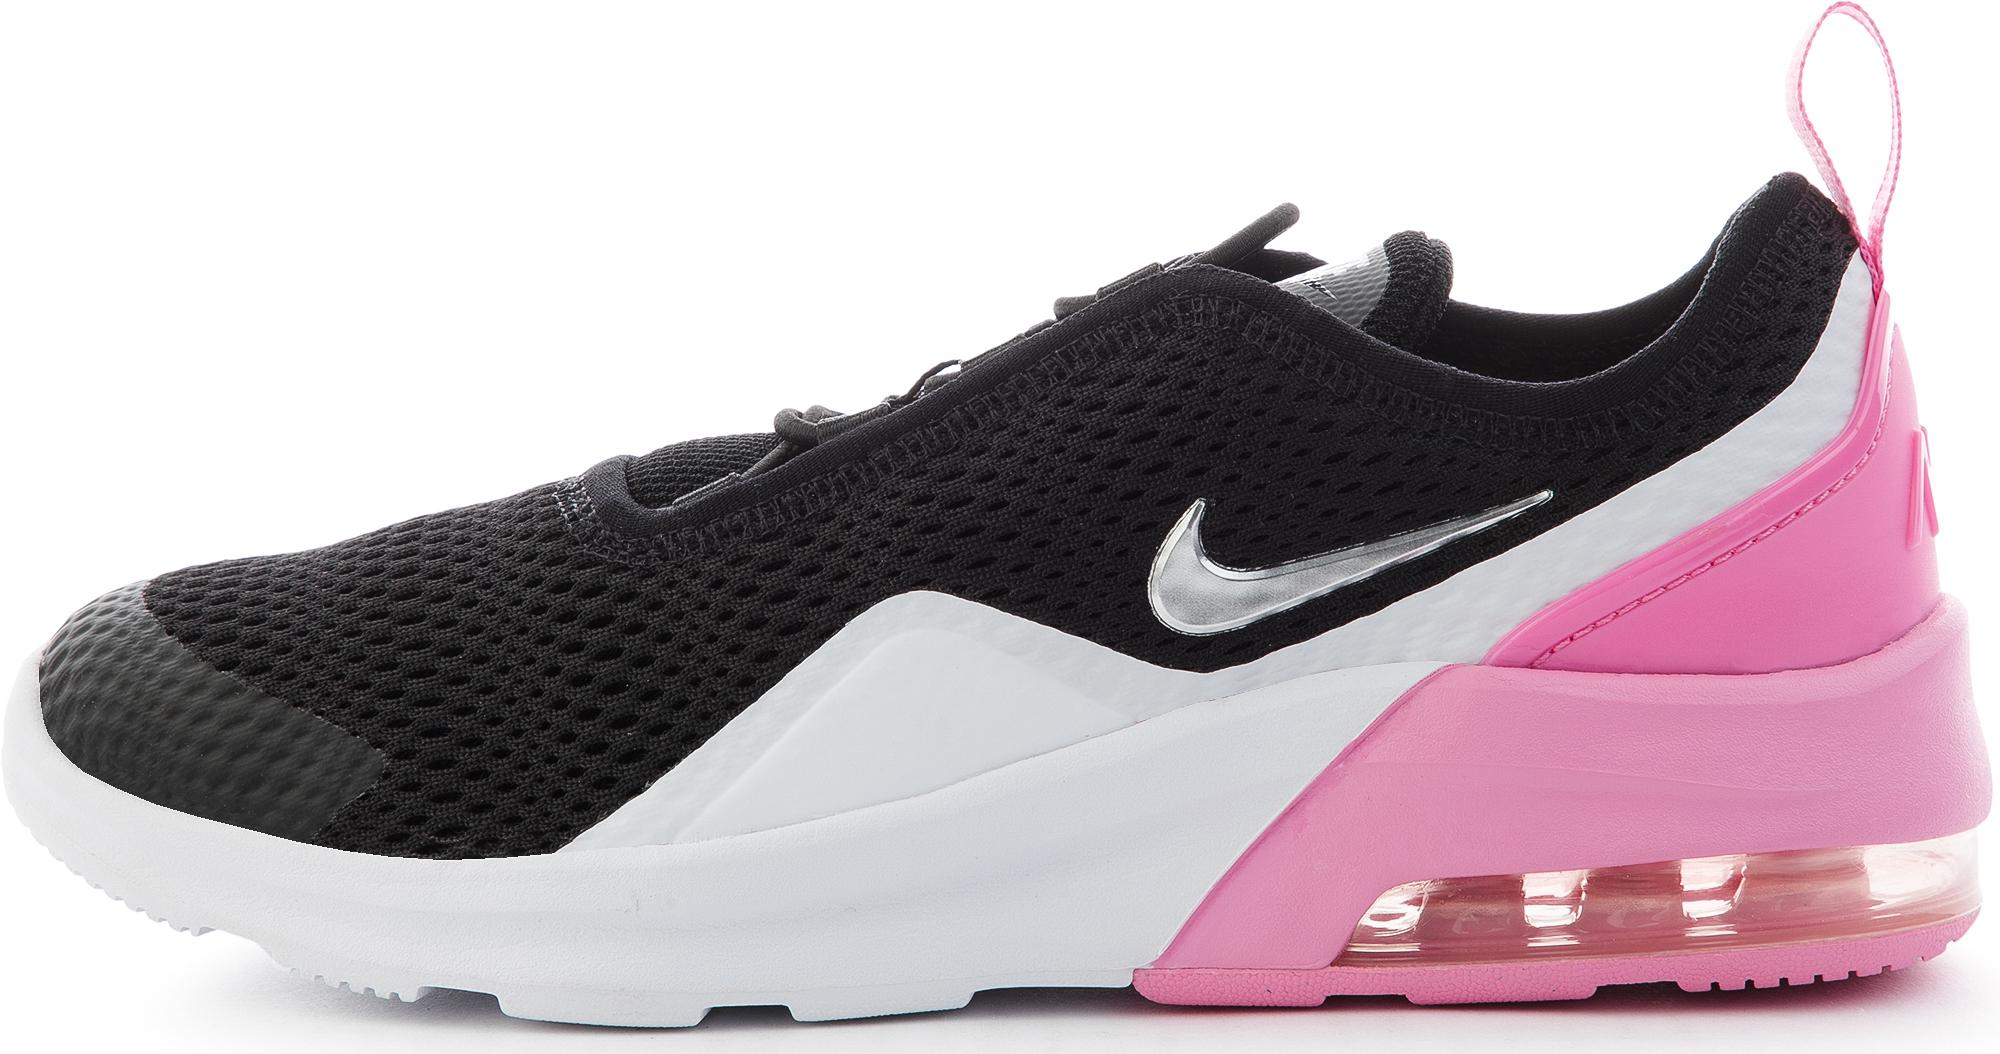 Nike Кроссовки для девочек Nike Air Max Motion 2, размер 30